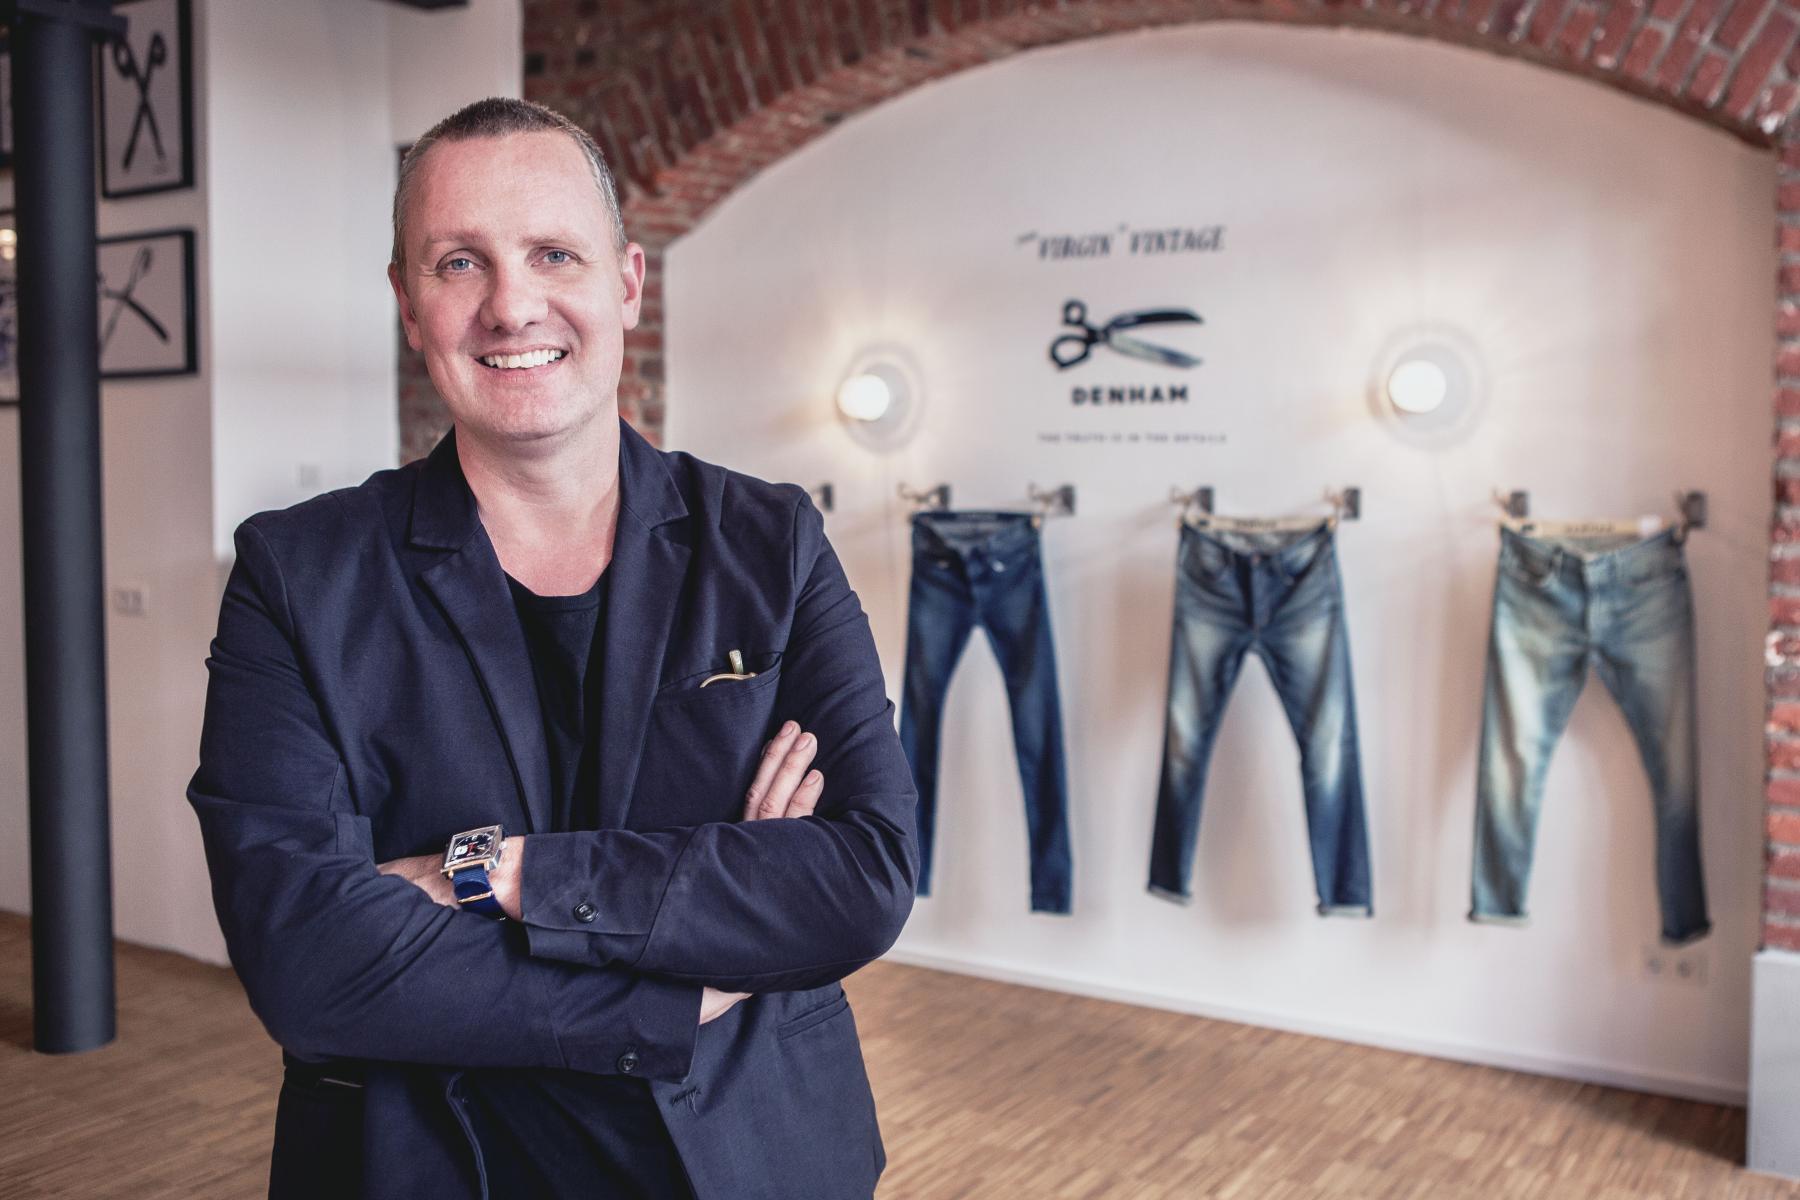 Horecare Jason Denham samenwerking tweede kledinglijn events personeel